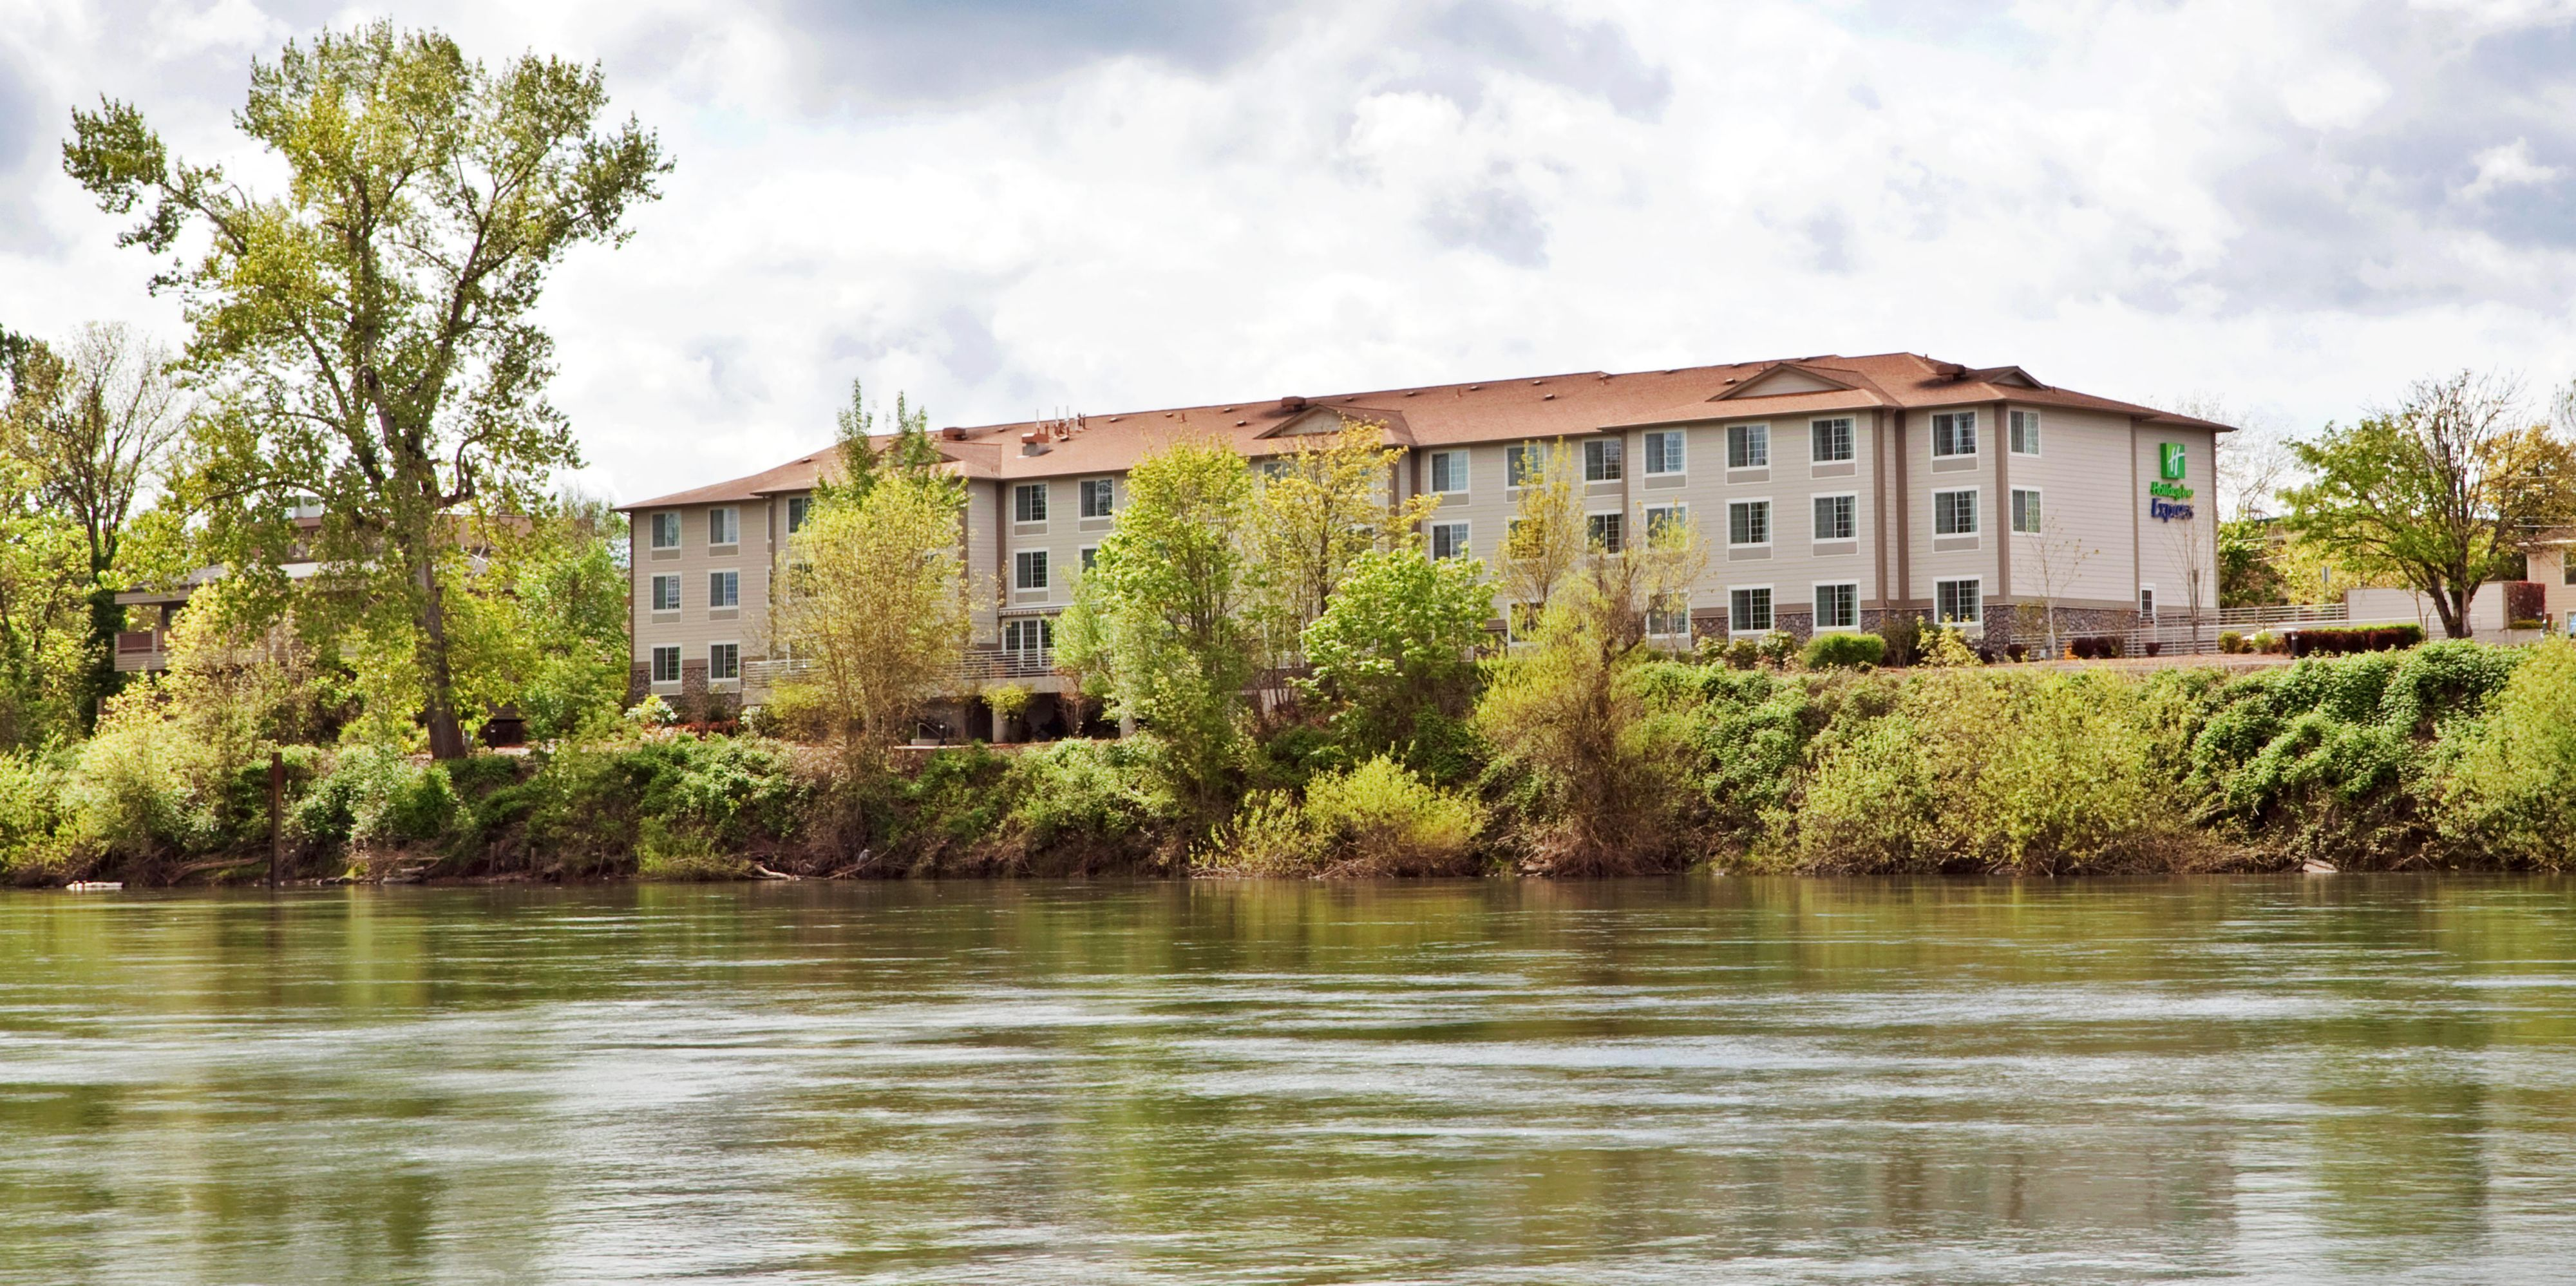 Corvallis Oregon dating site Waco speed dating